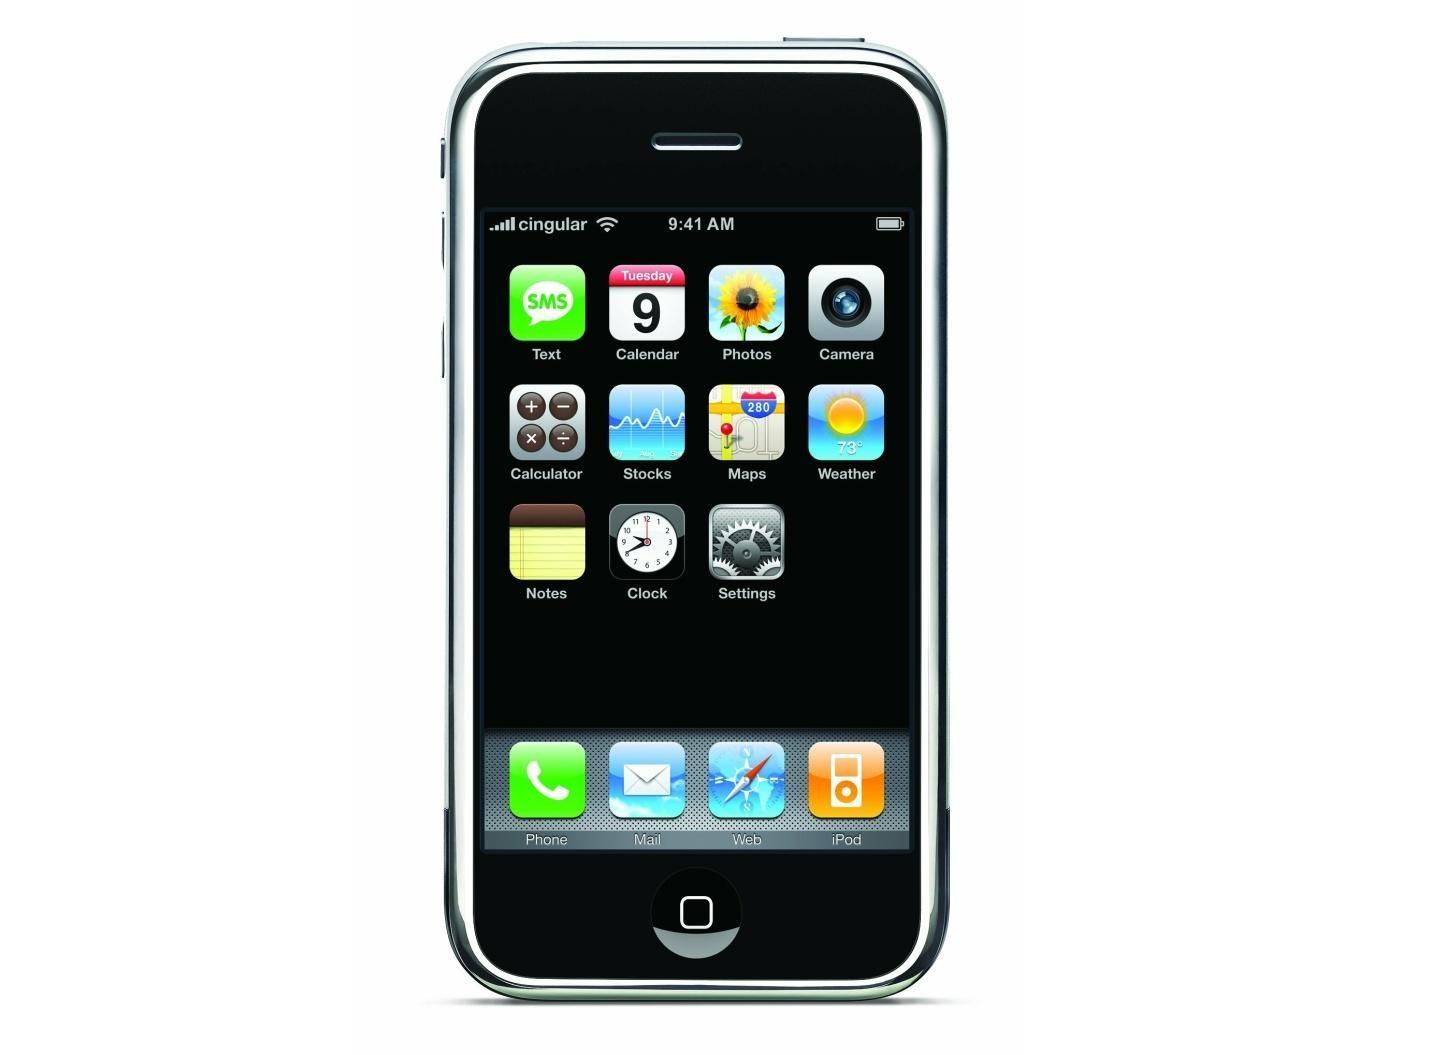 iphone in 2007